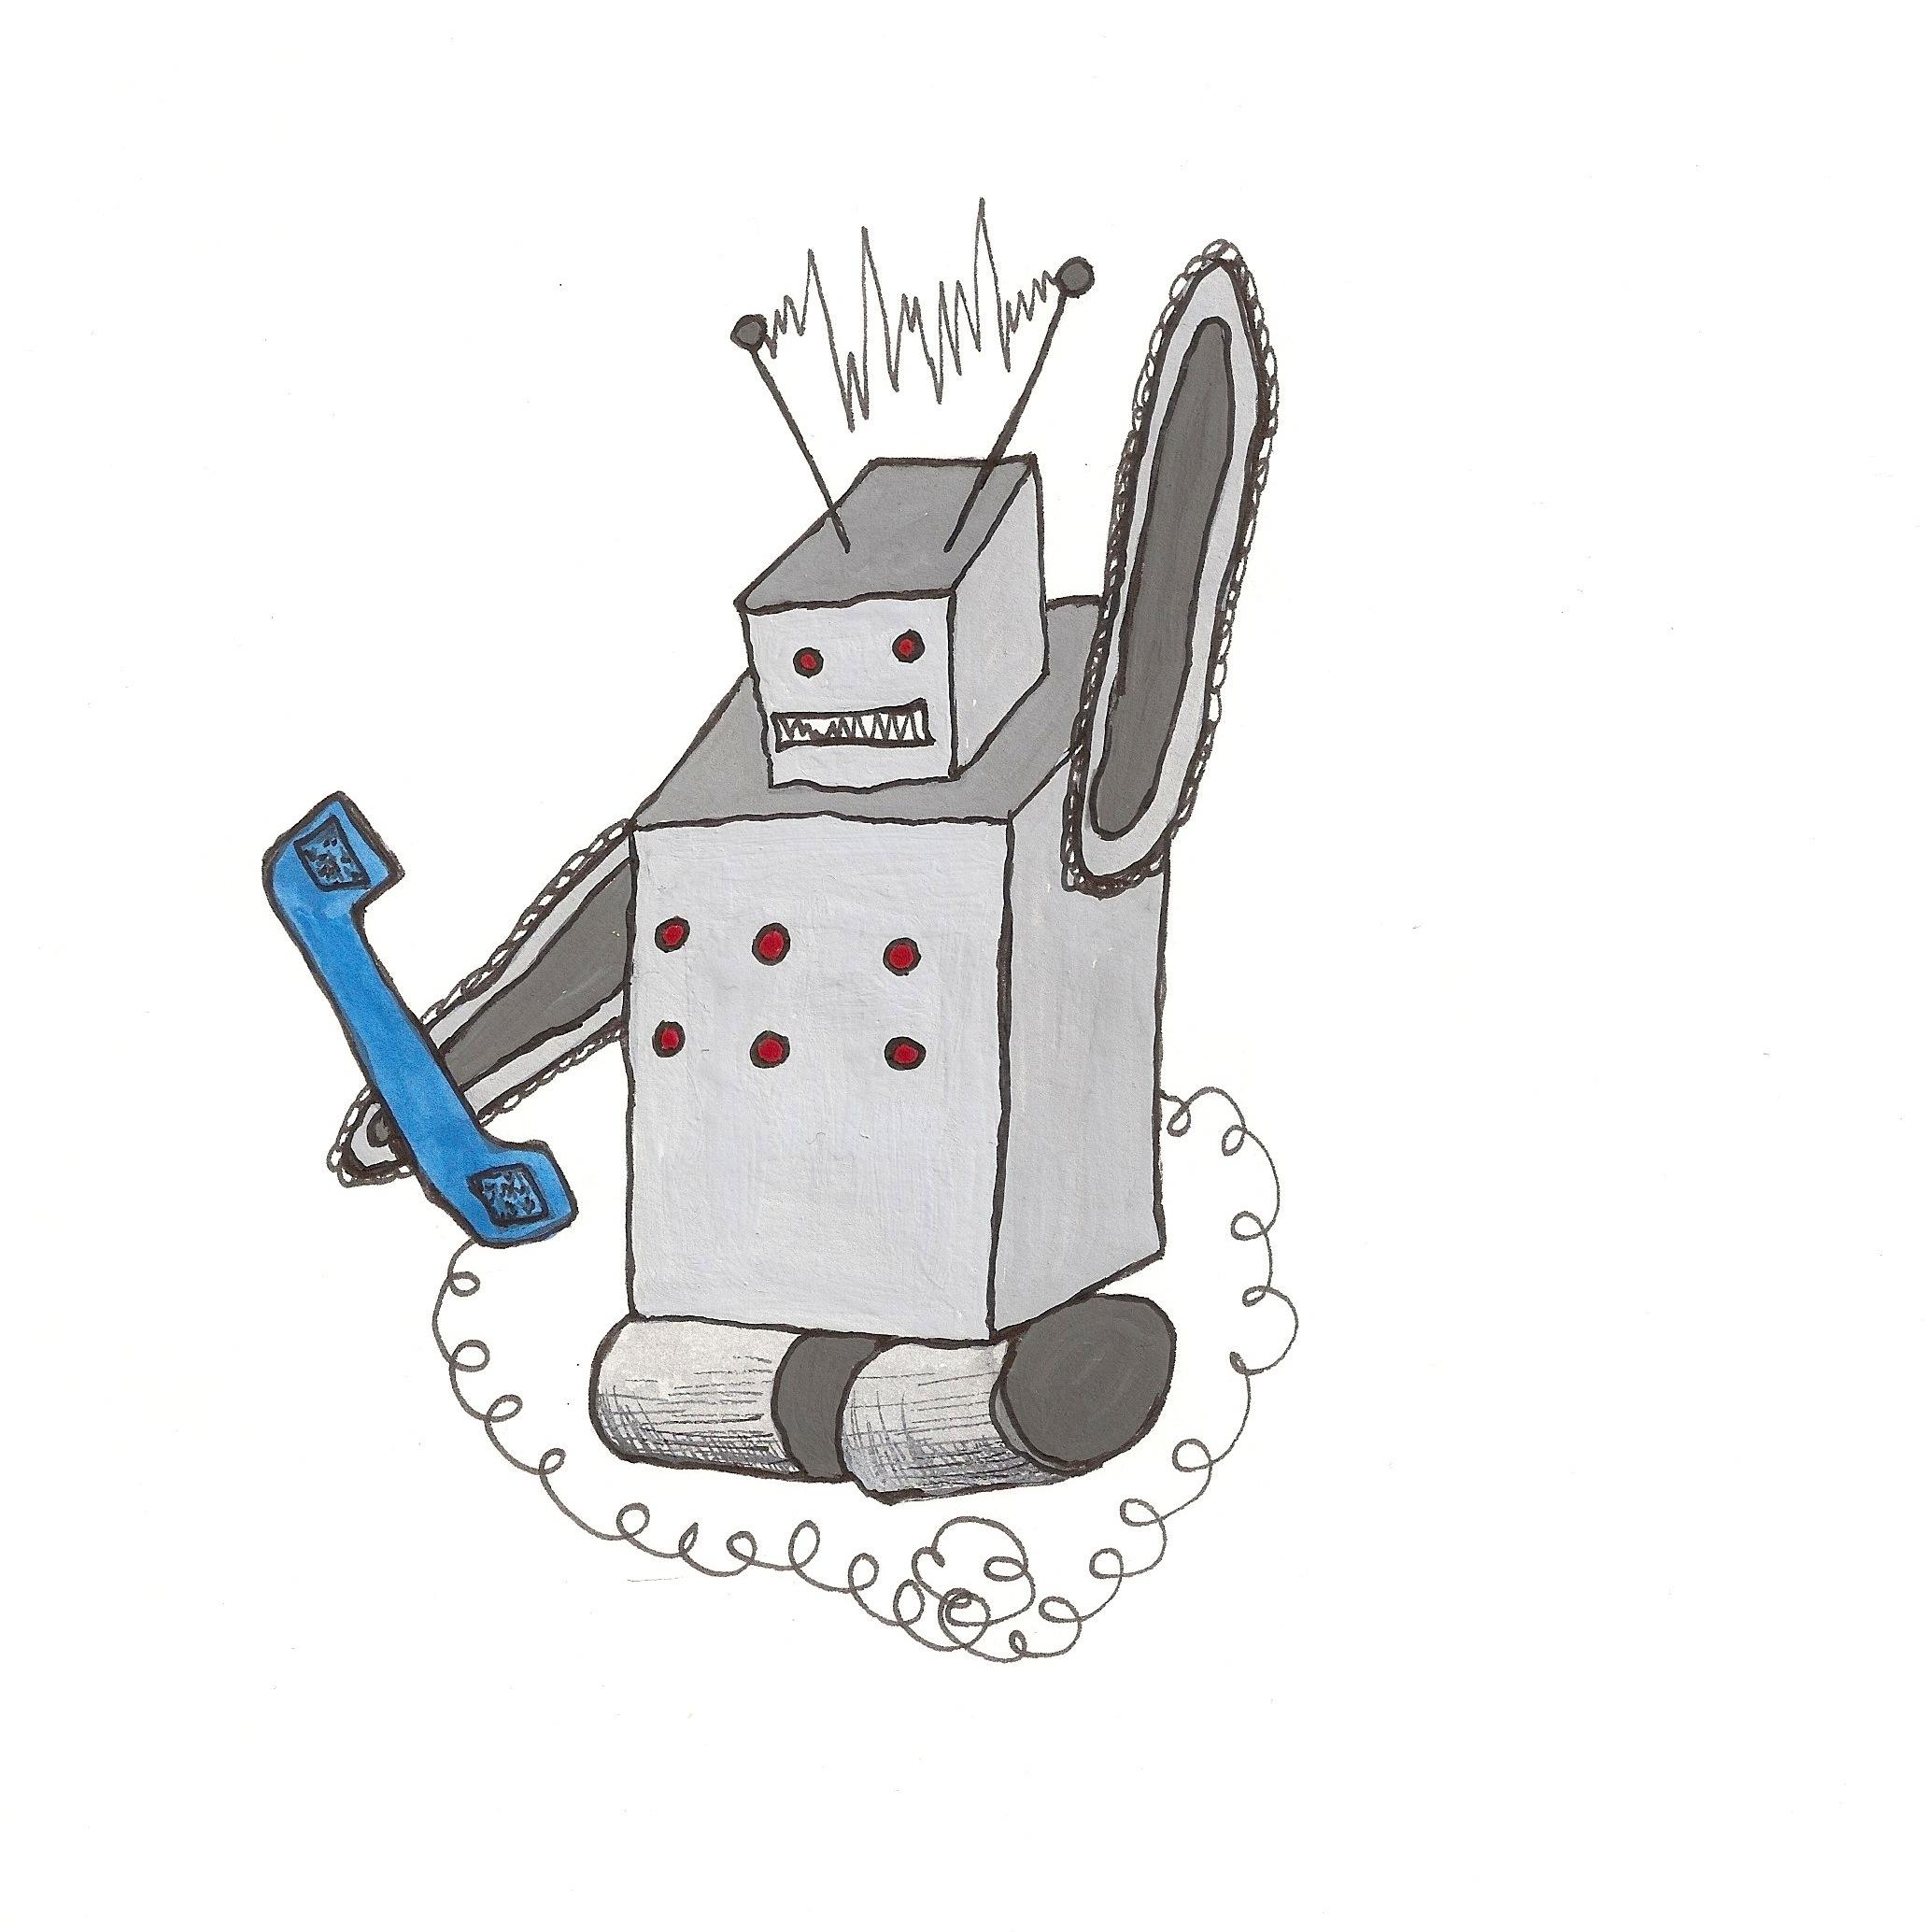 Phonebots